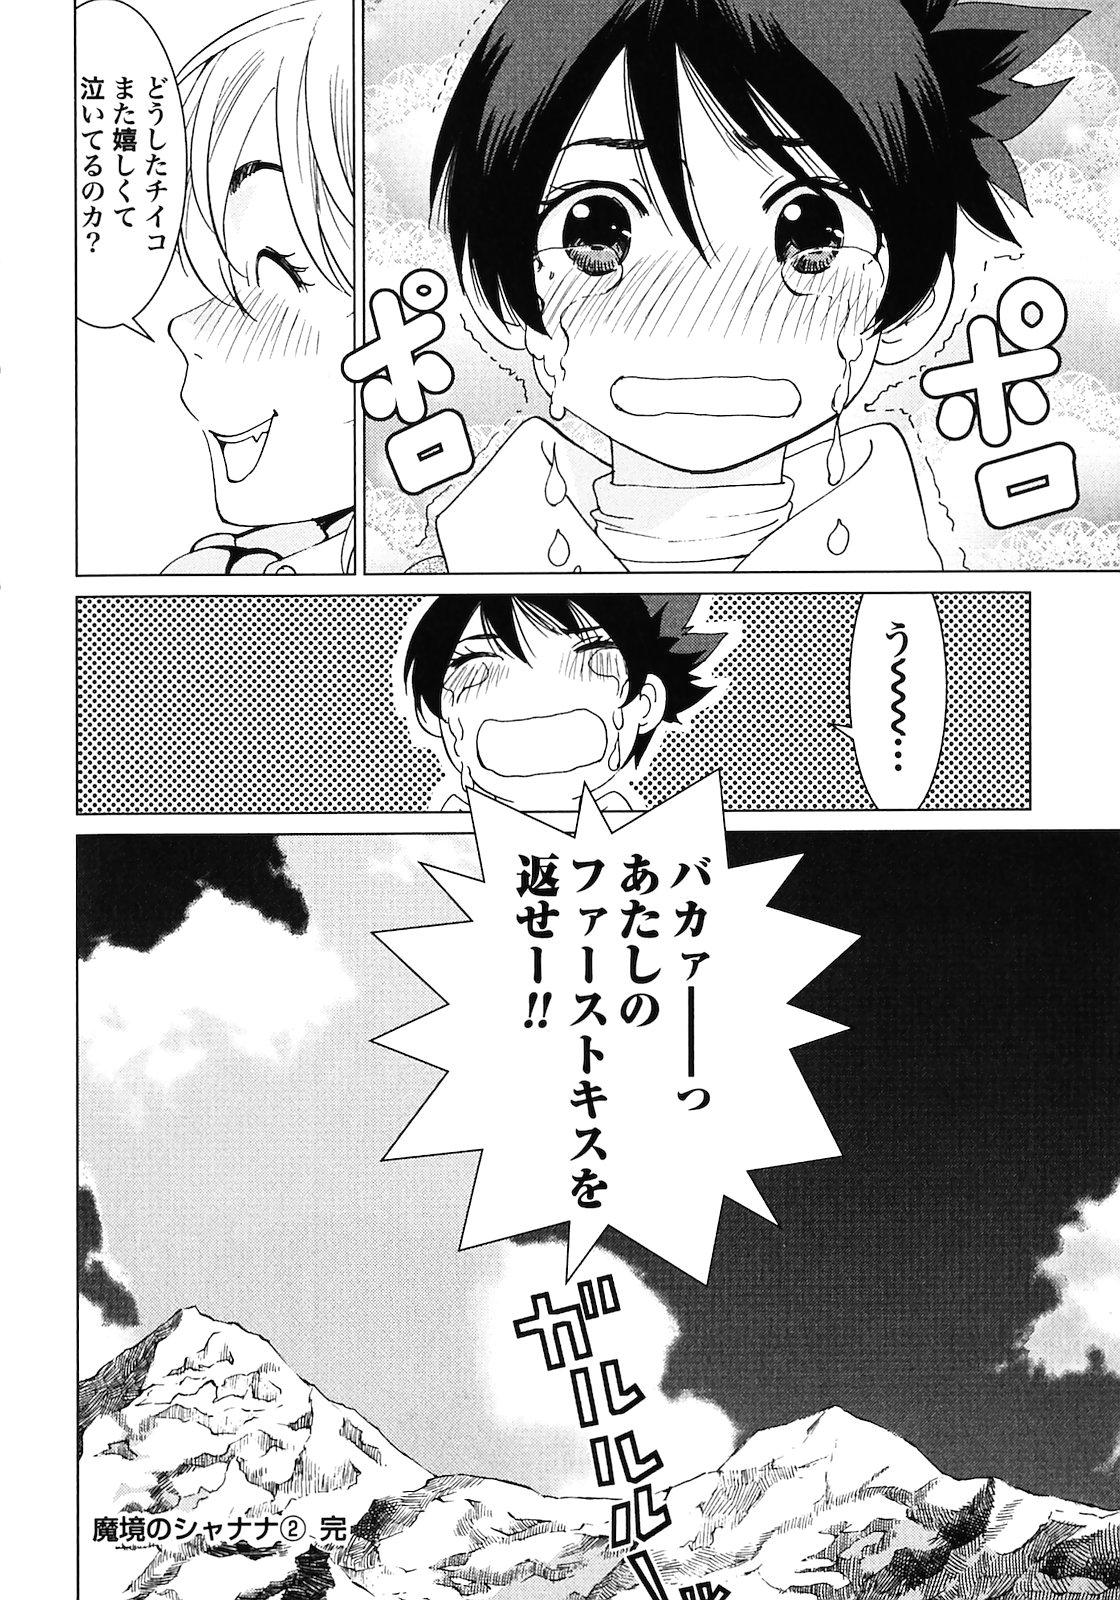 Makyo no Shanana Vol.02 191